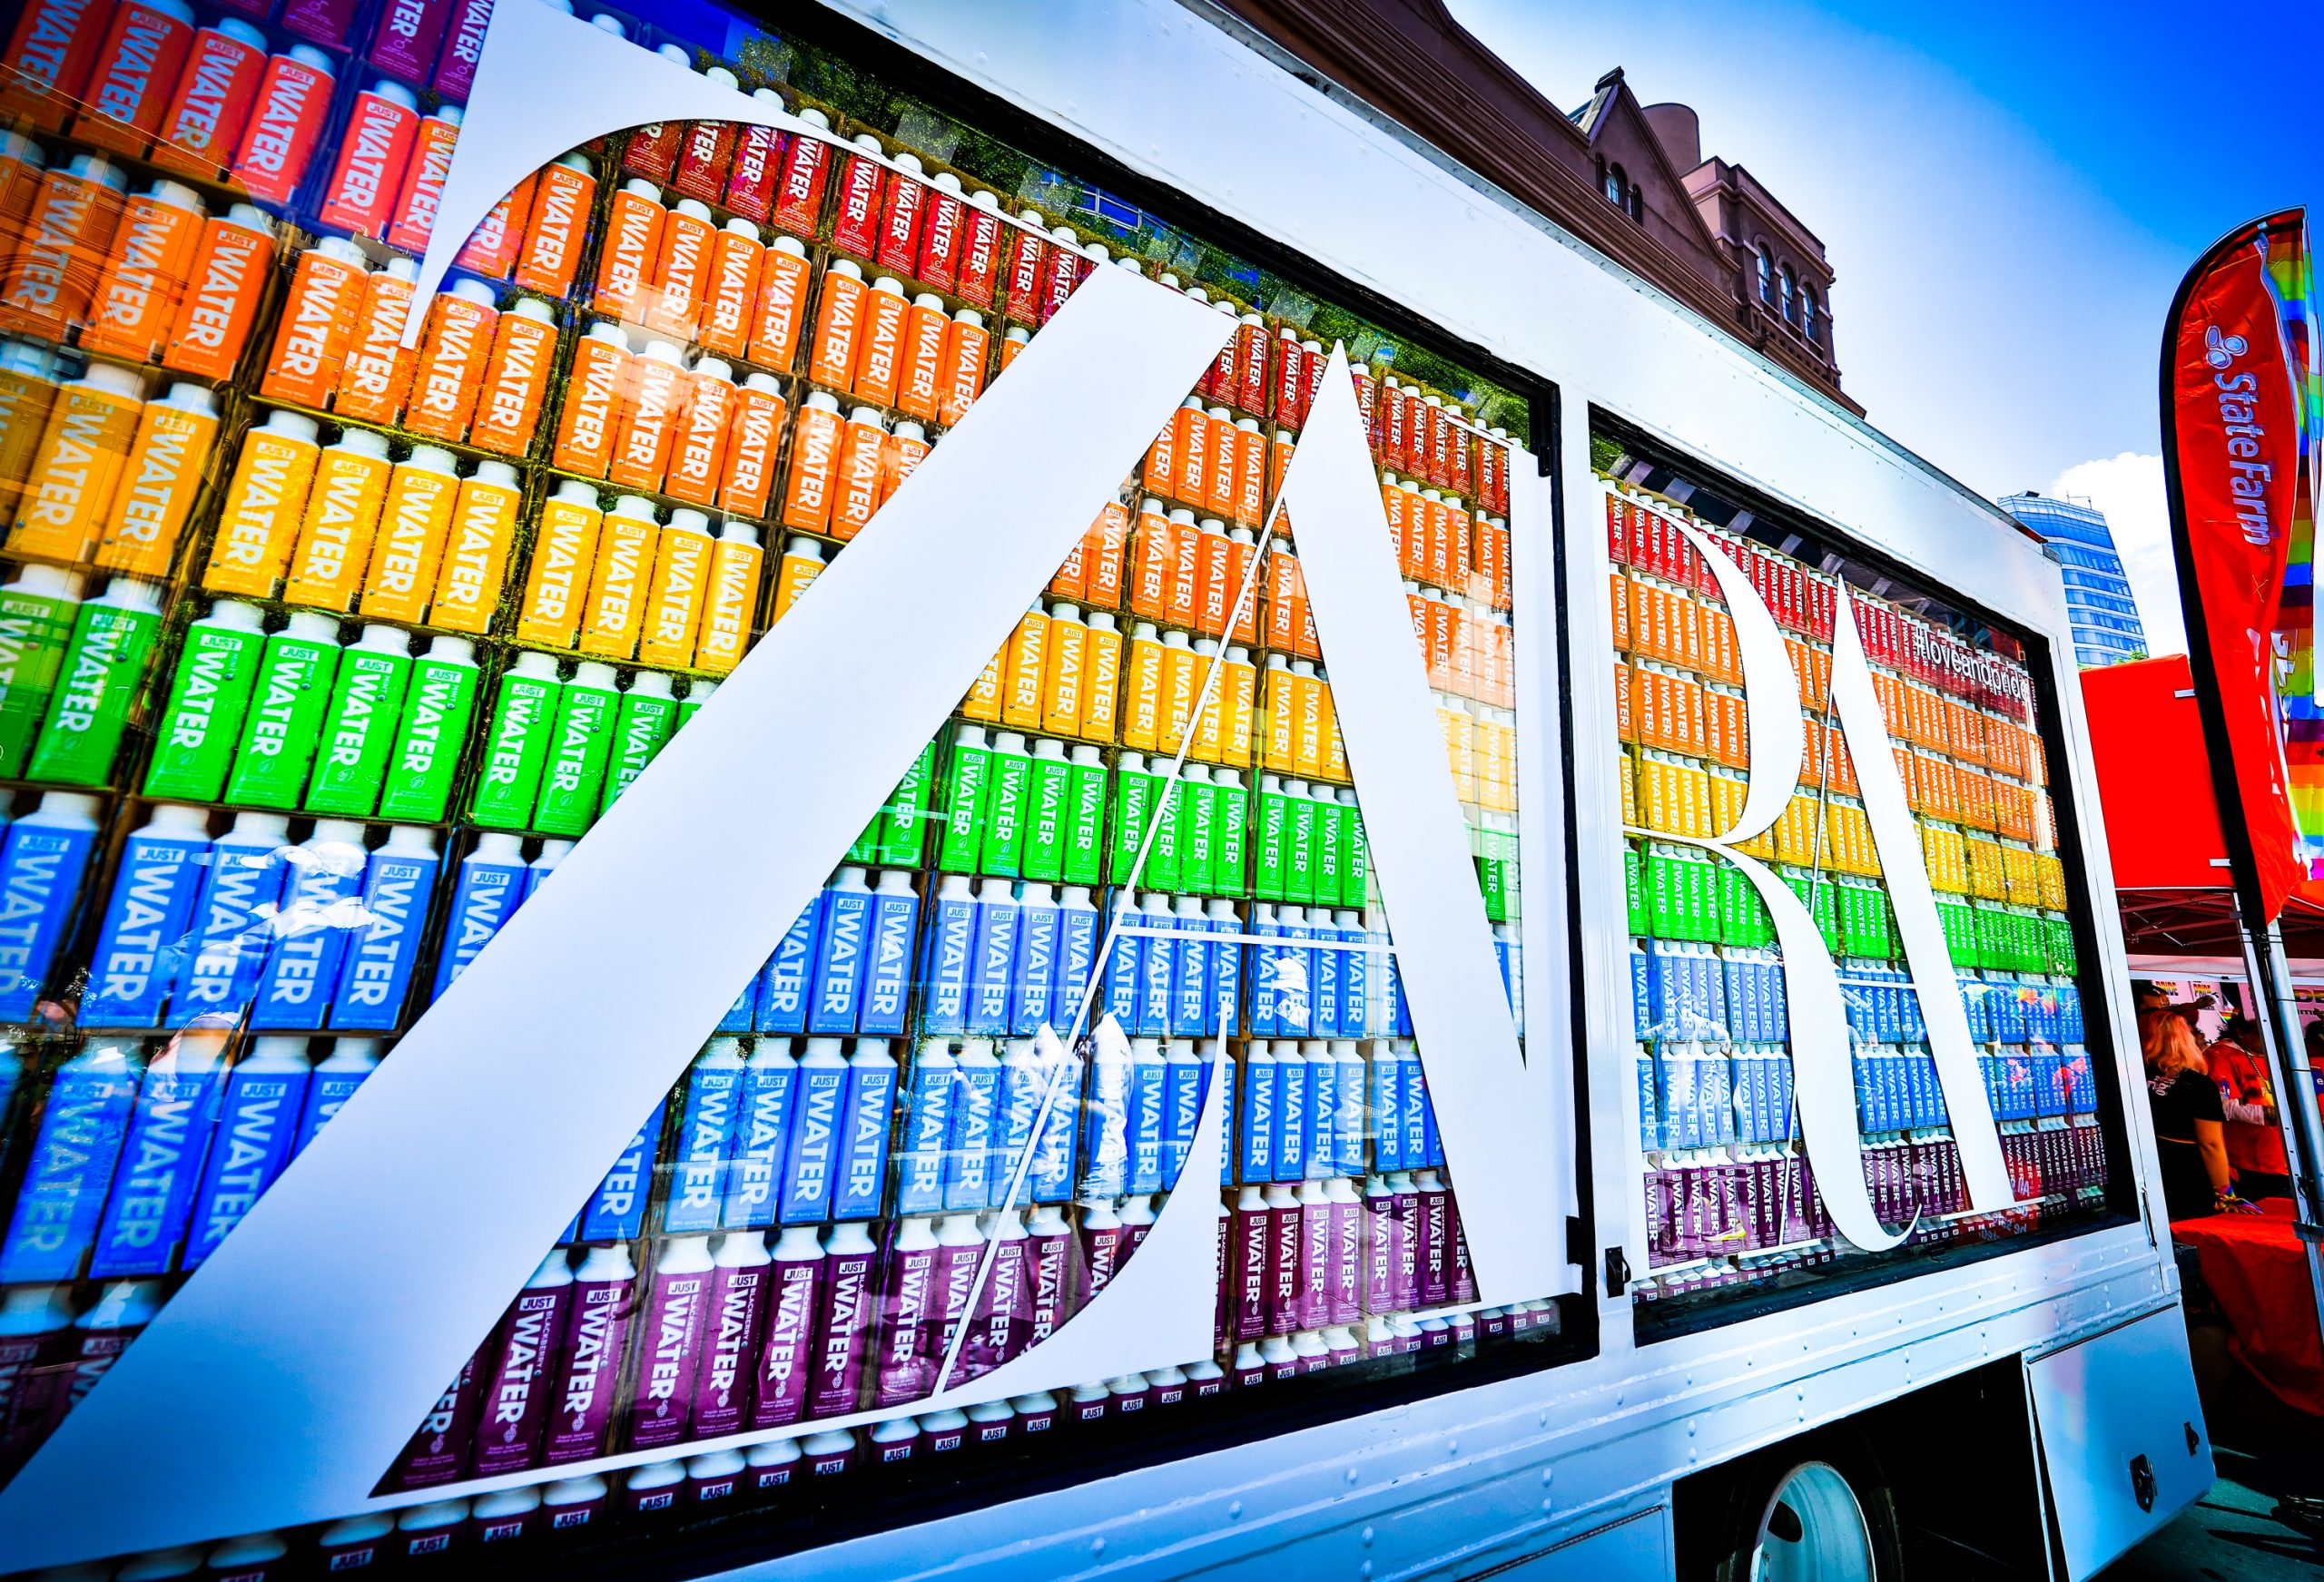 Zara Gay Pride 2019 Just Water Promotion